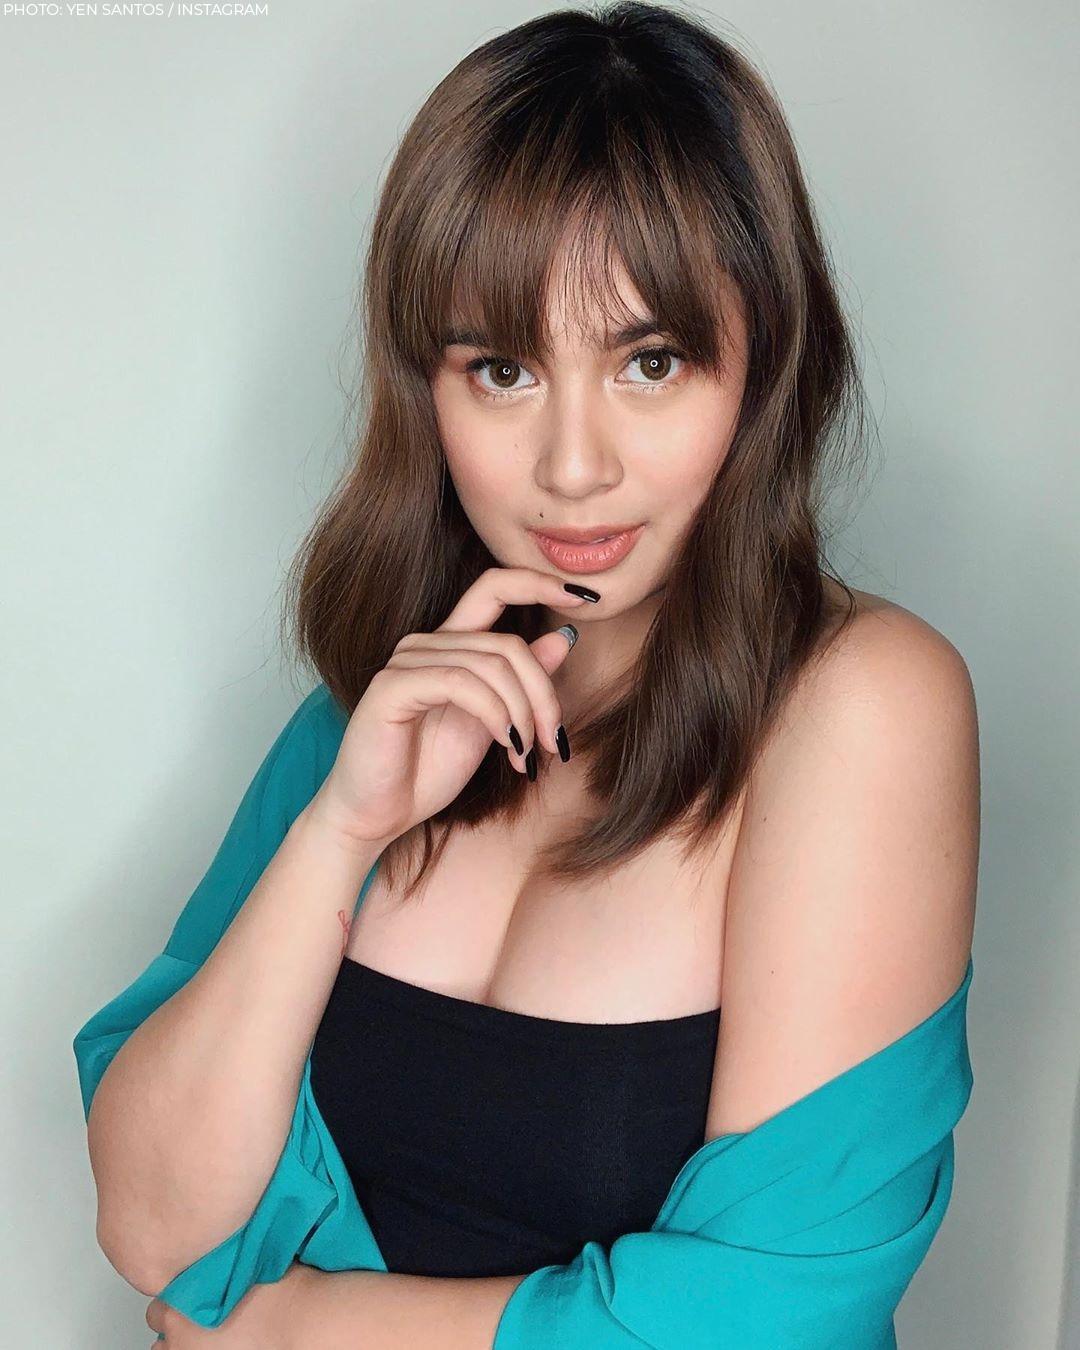 Yen Santos' sexiest moments